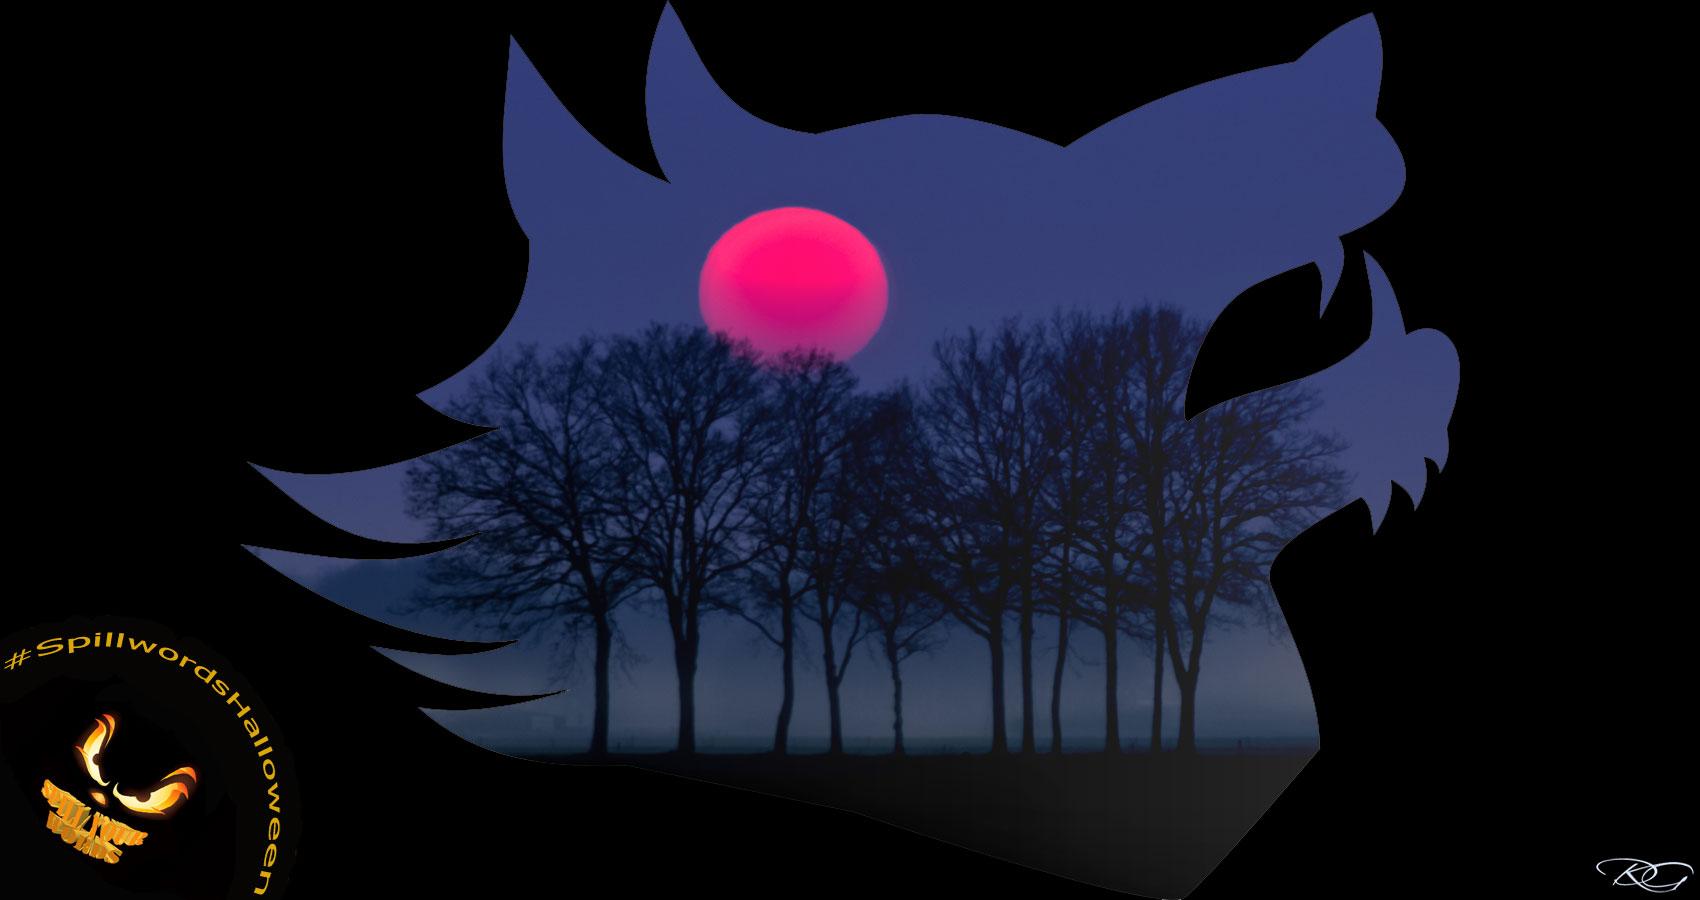 Crimson Moon, written by Verona Jones at Spillwords.com